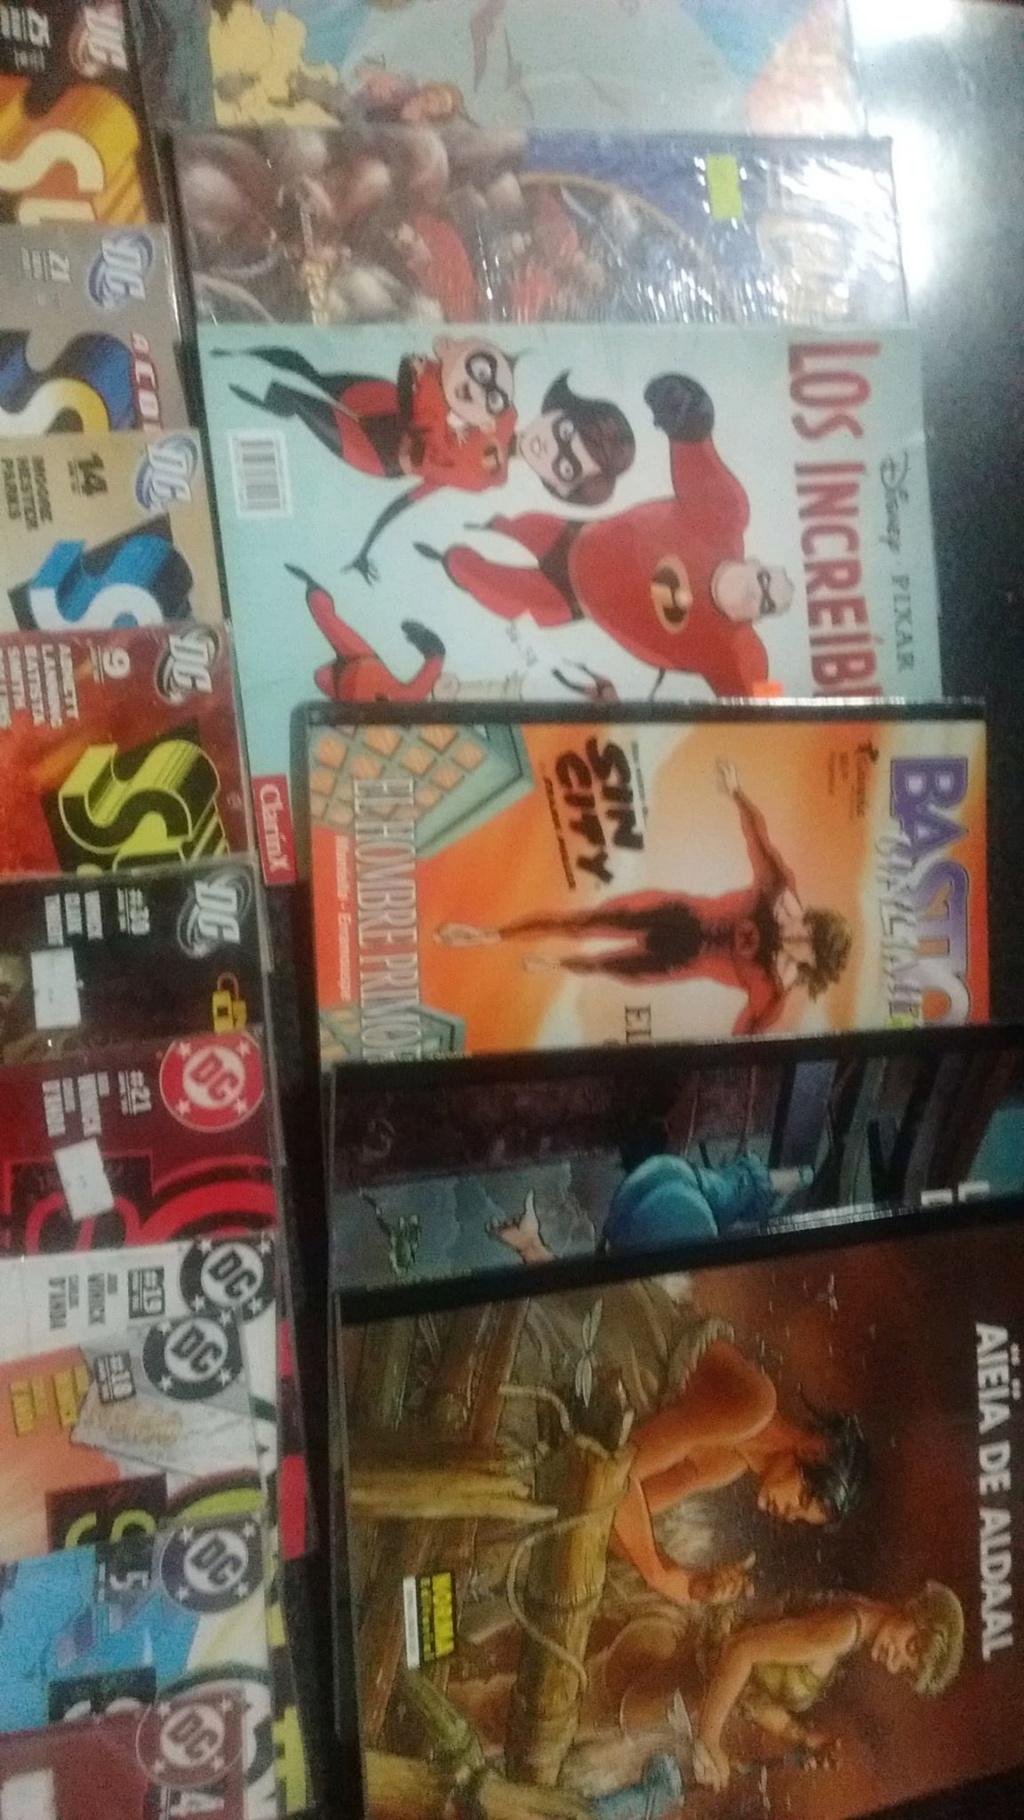 [Comics] Siguen las adquisiciones 2018 - Página 4 Compra13